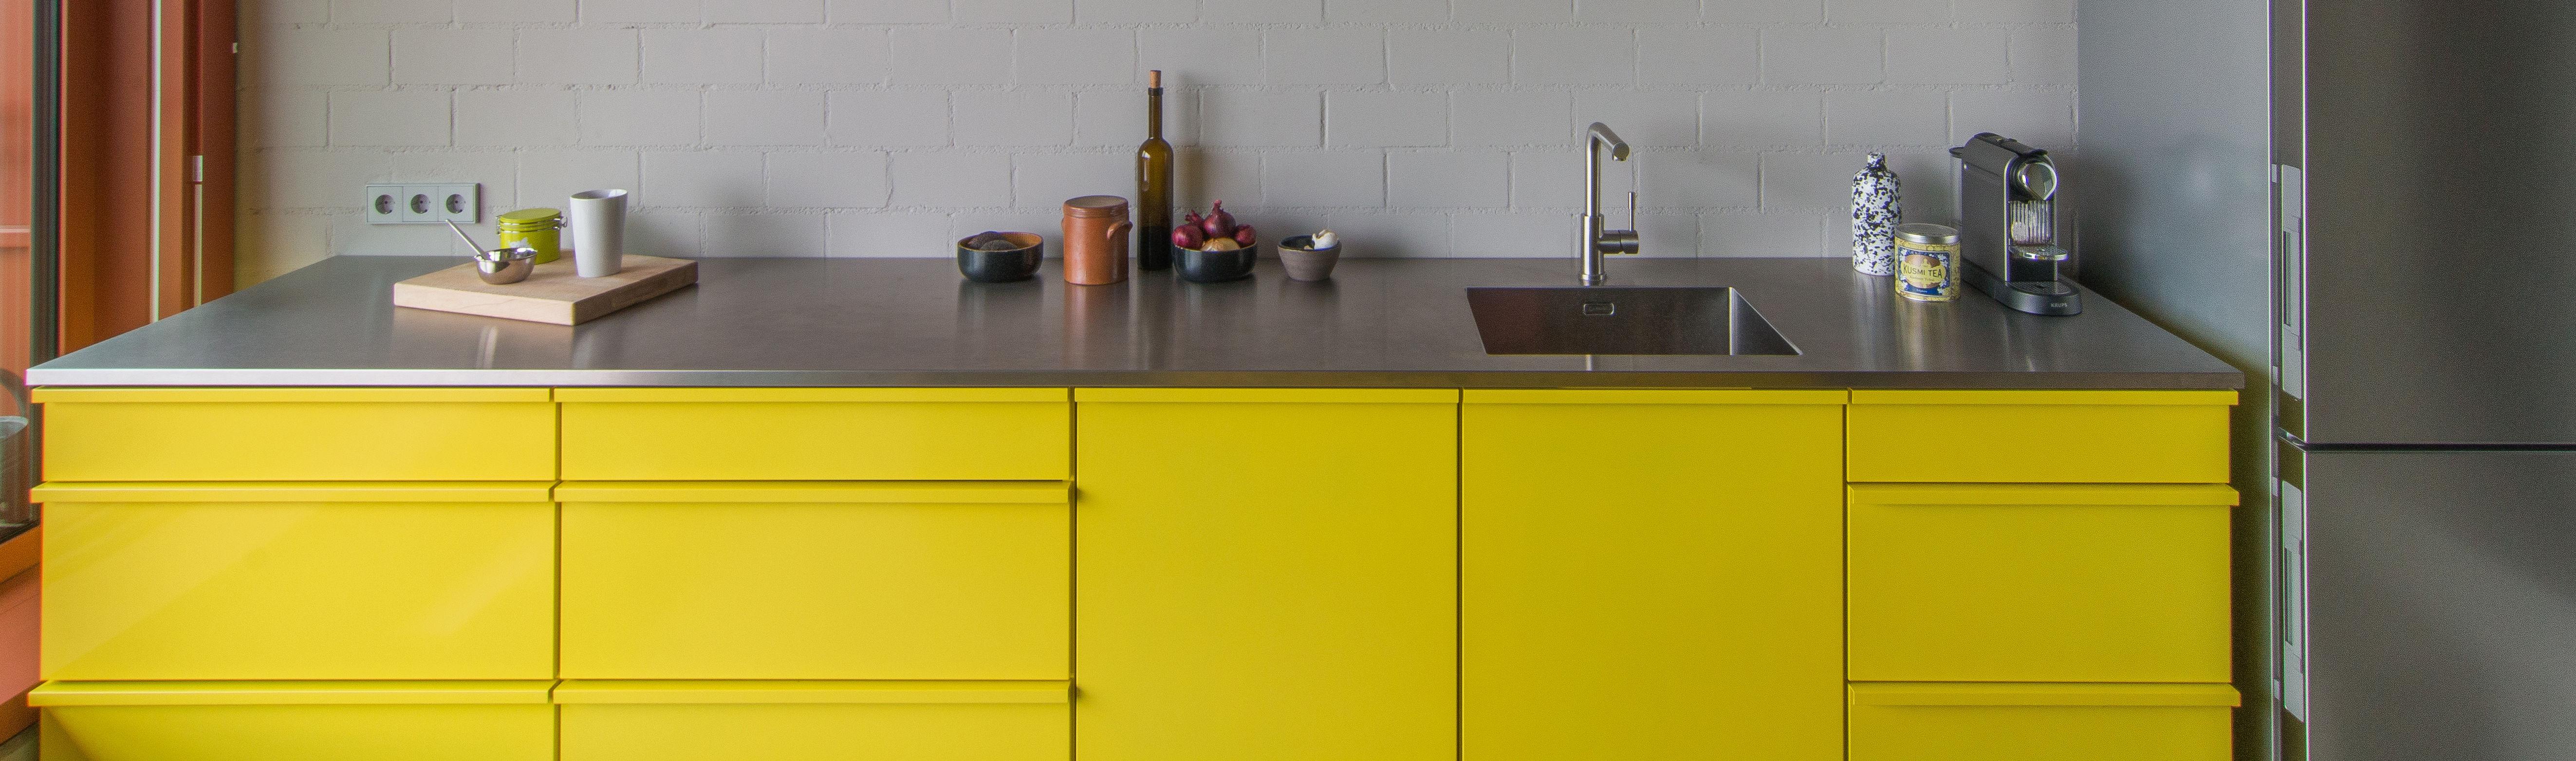 popstahl k chen berchtesgaden mutfak planlay c lar. Black Bedroom Furniture Sets. Home Design Ideas